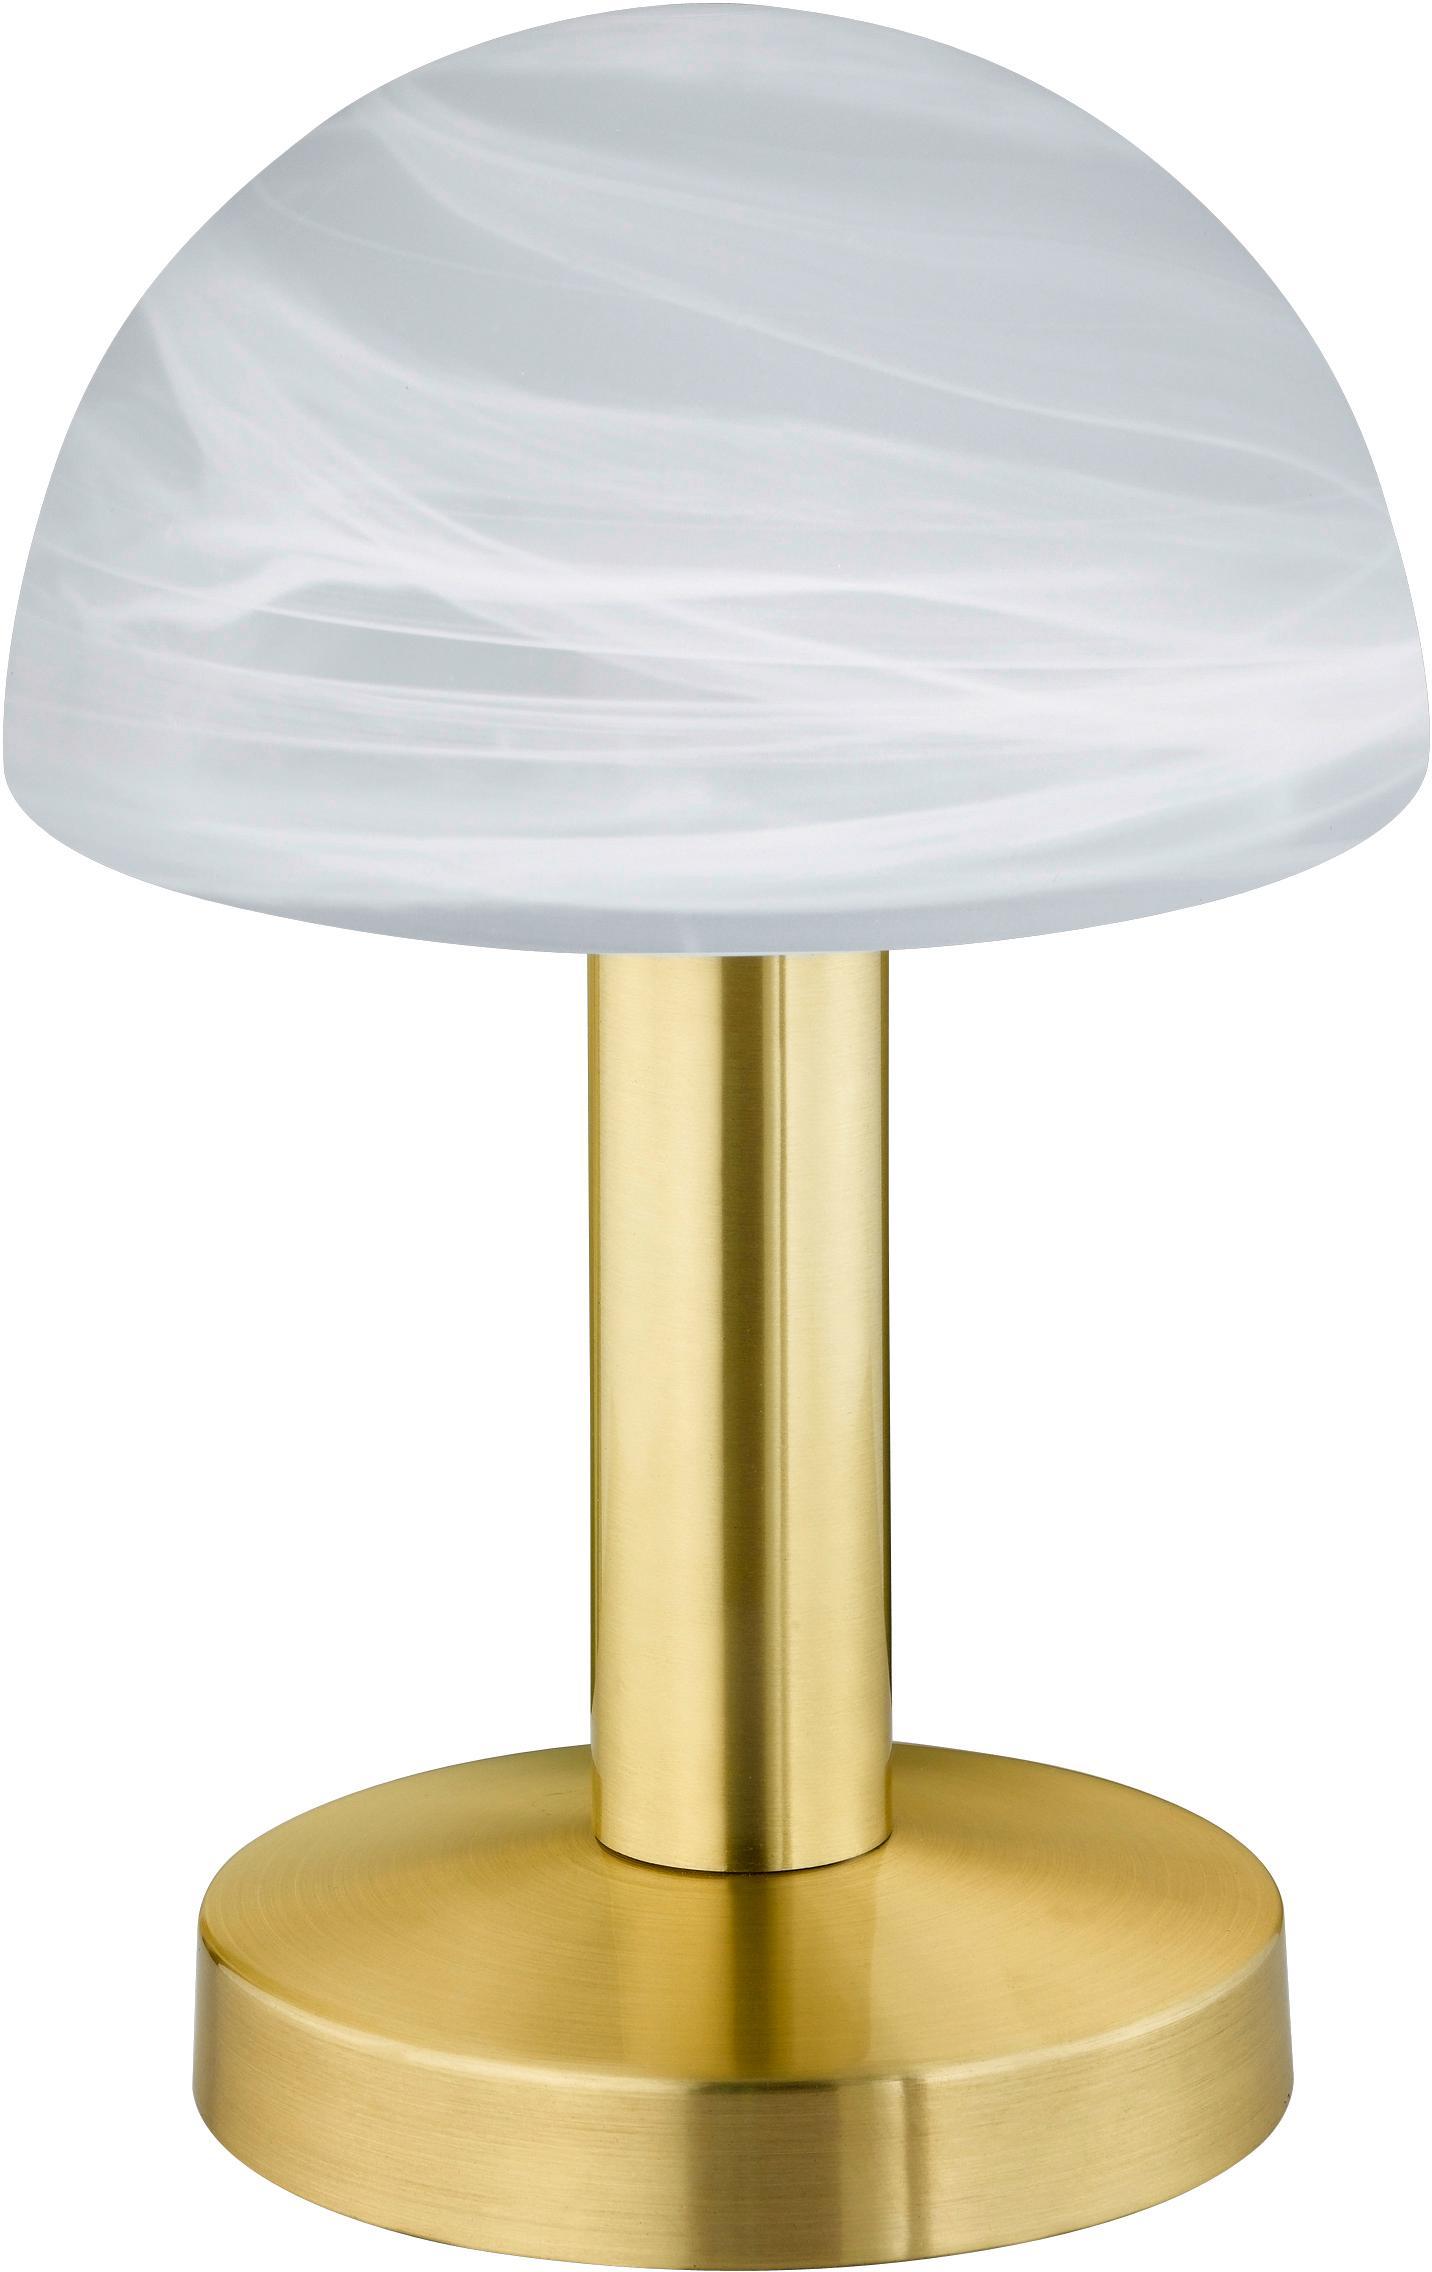 TRIO Leuchten LED Tischleuchte LED TOUCH, E14, Warmweiß